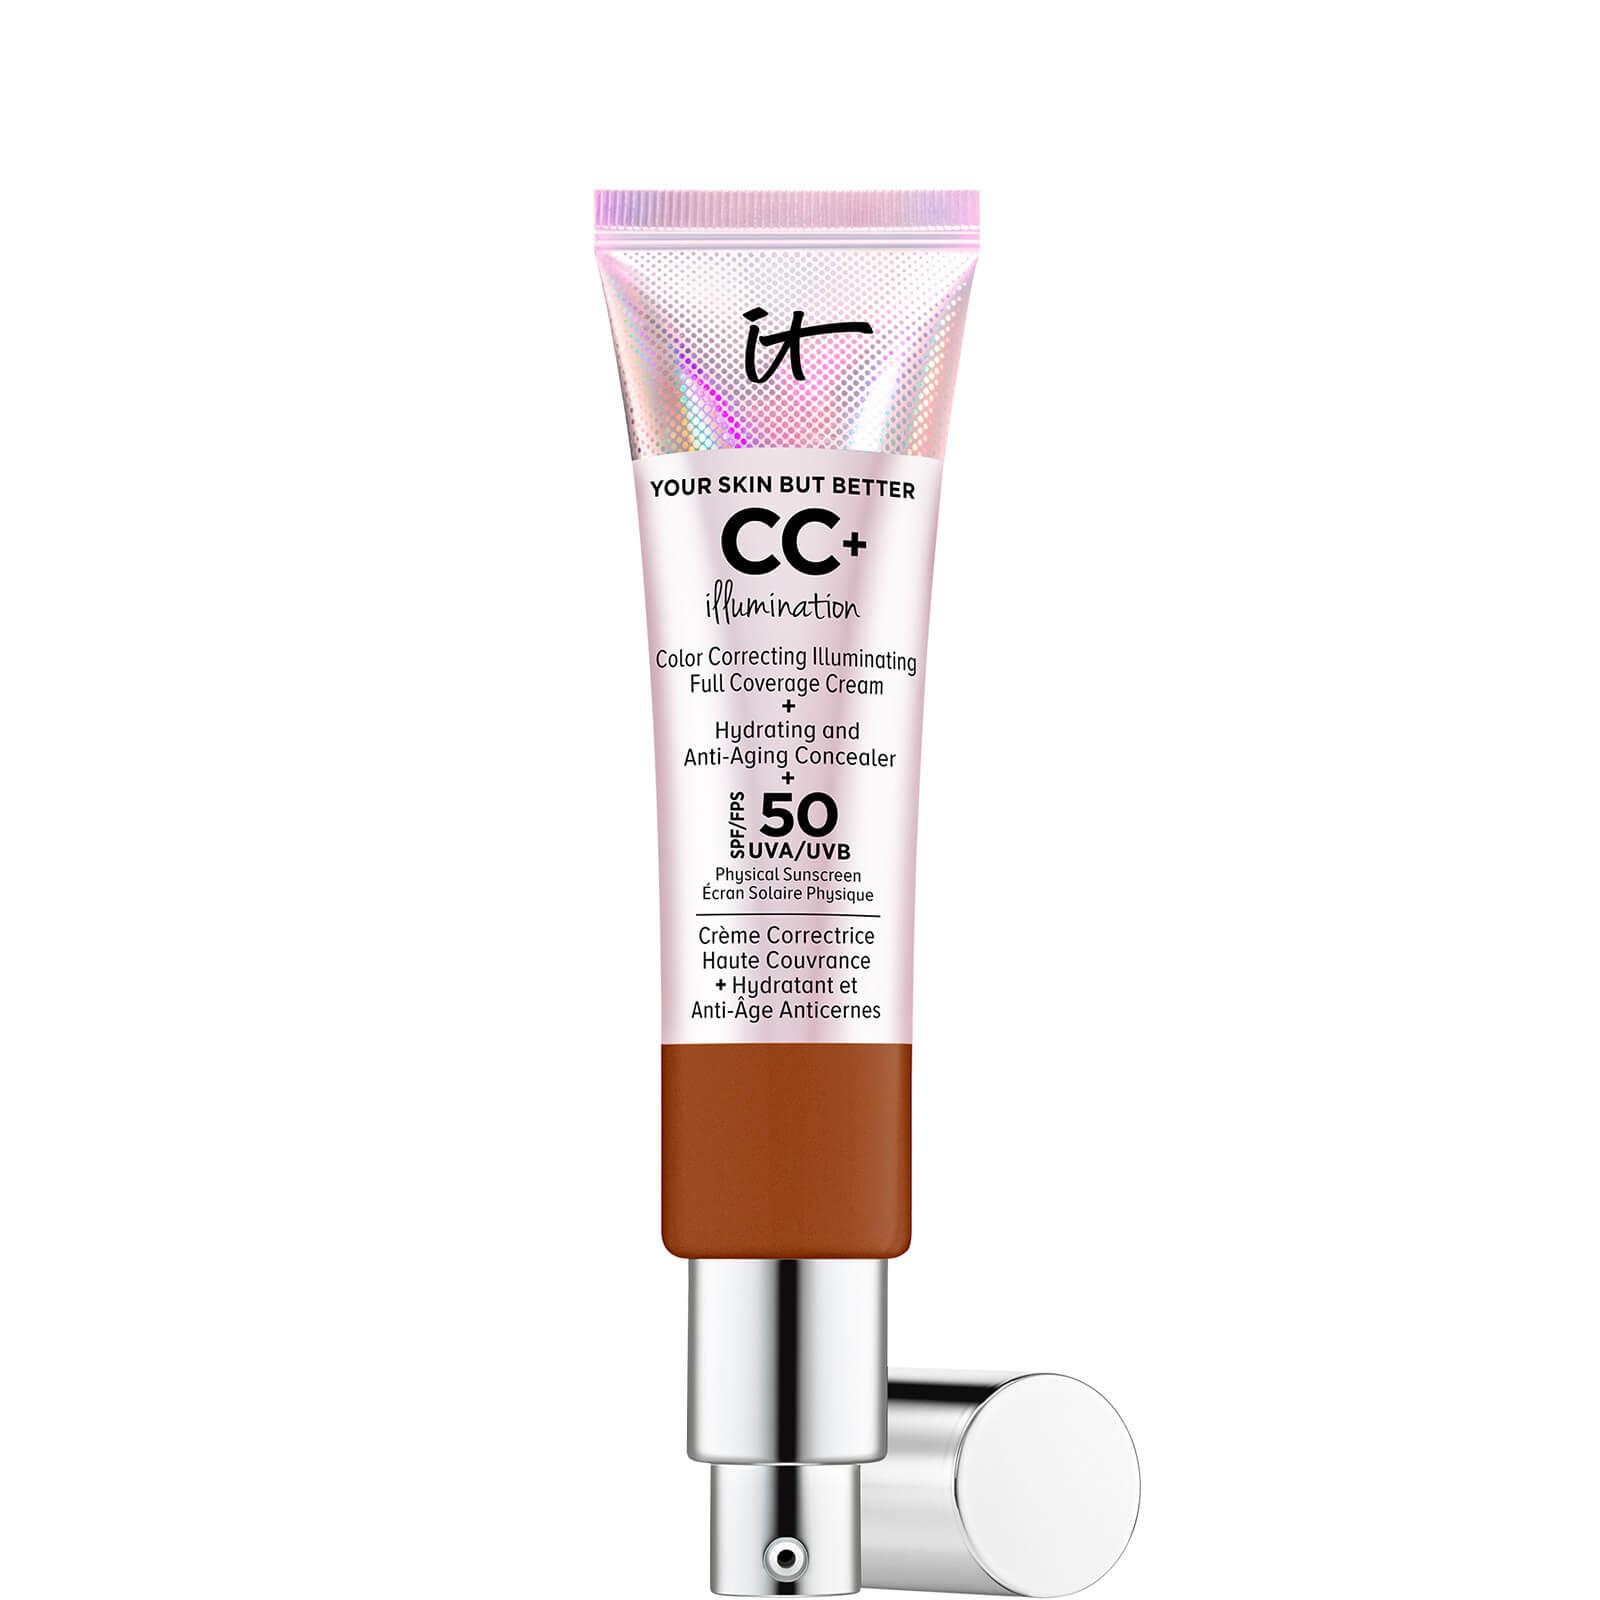 Купить IT Cosmetics Your Skin But Better CC+ Illumination SPF50 32ml (Various Shades) - Rich Honey